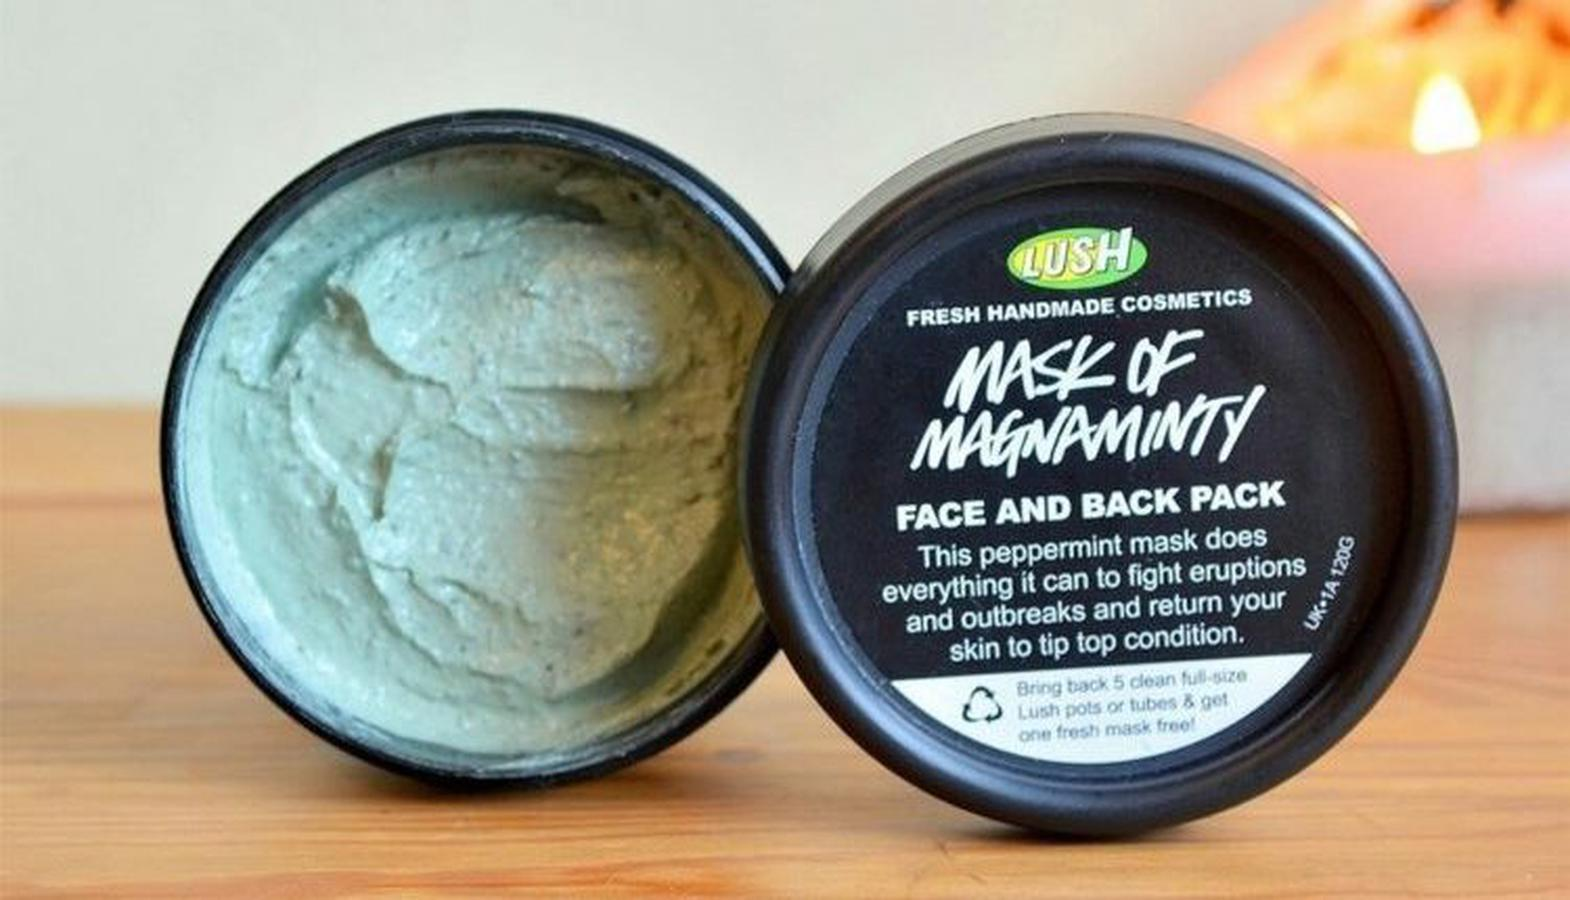 Mặt Nạ Đất Sét Tươi Lush Mask Of Magnaminty